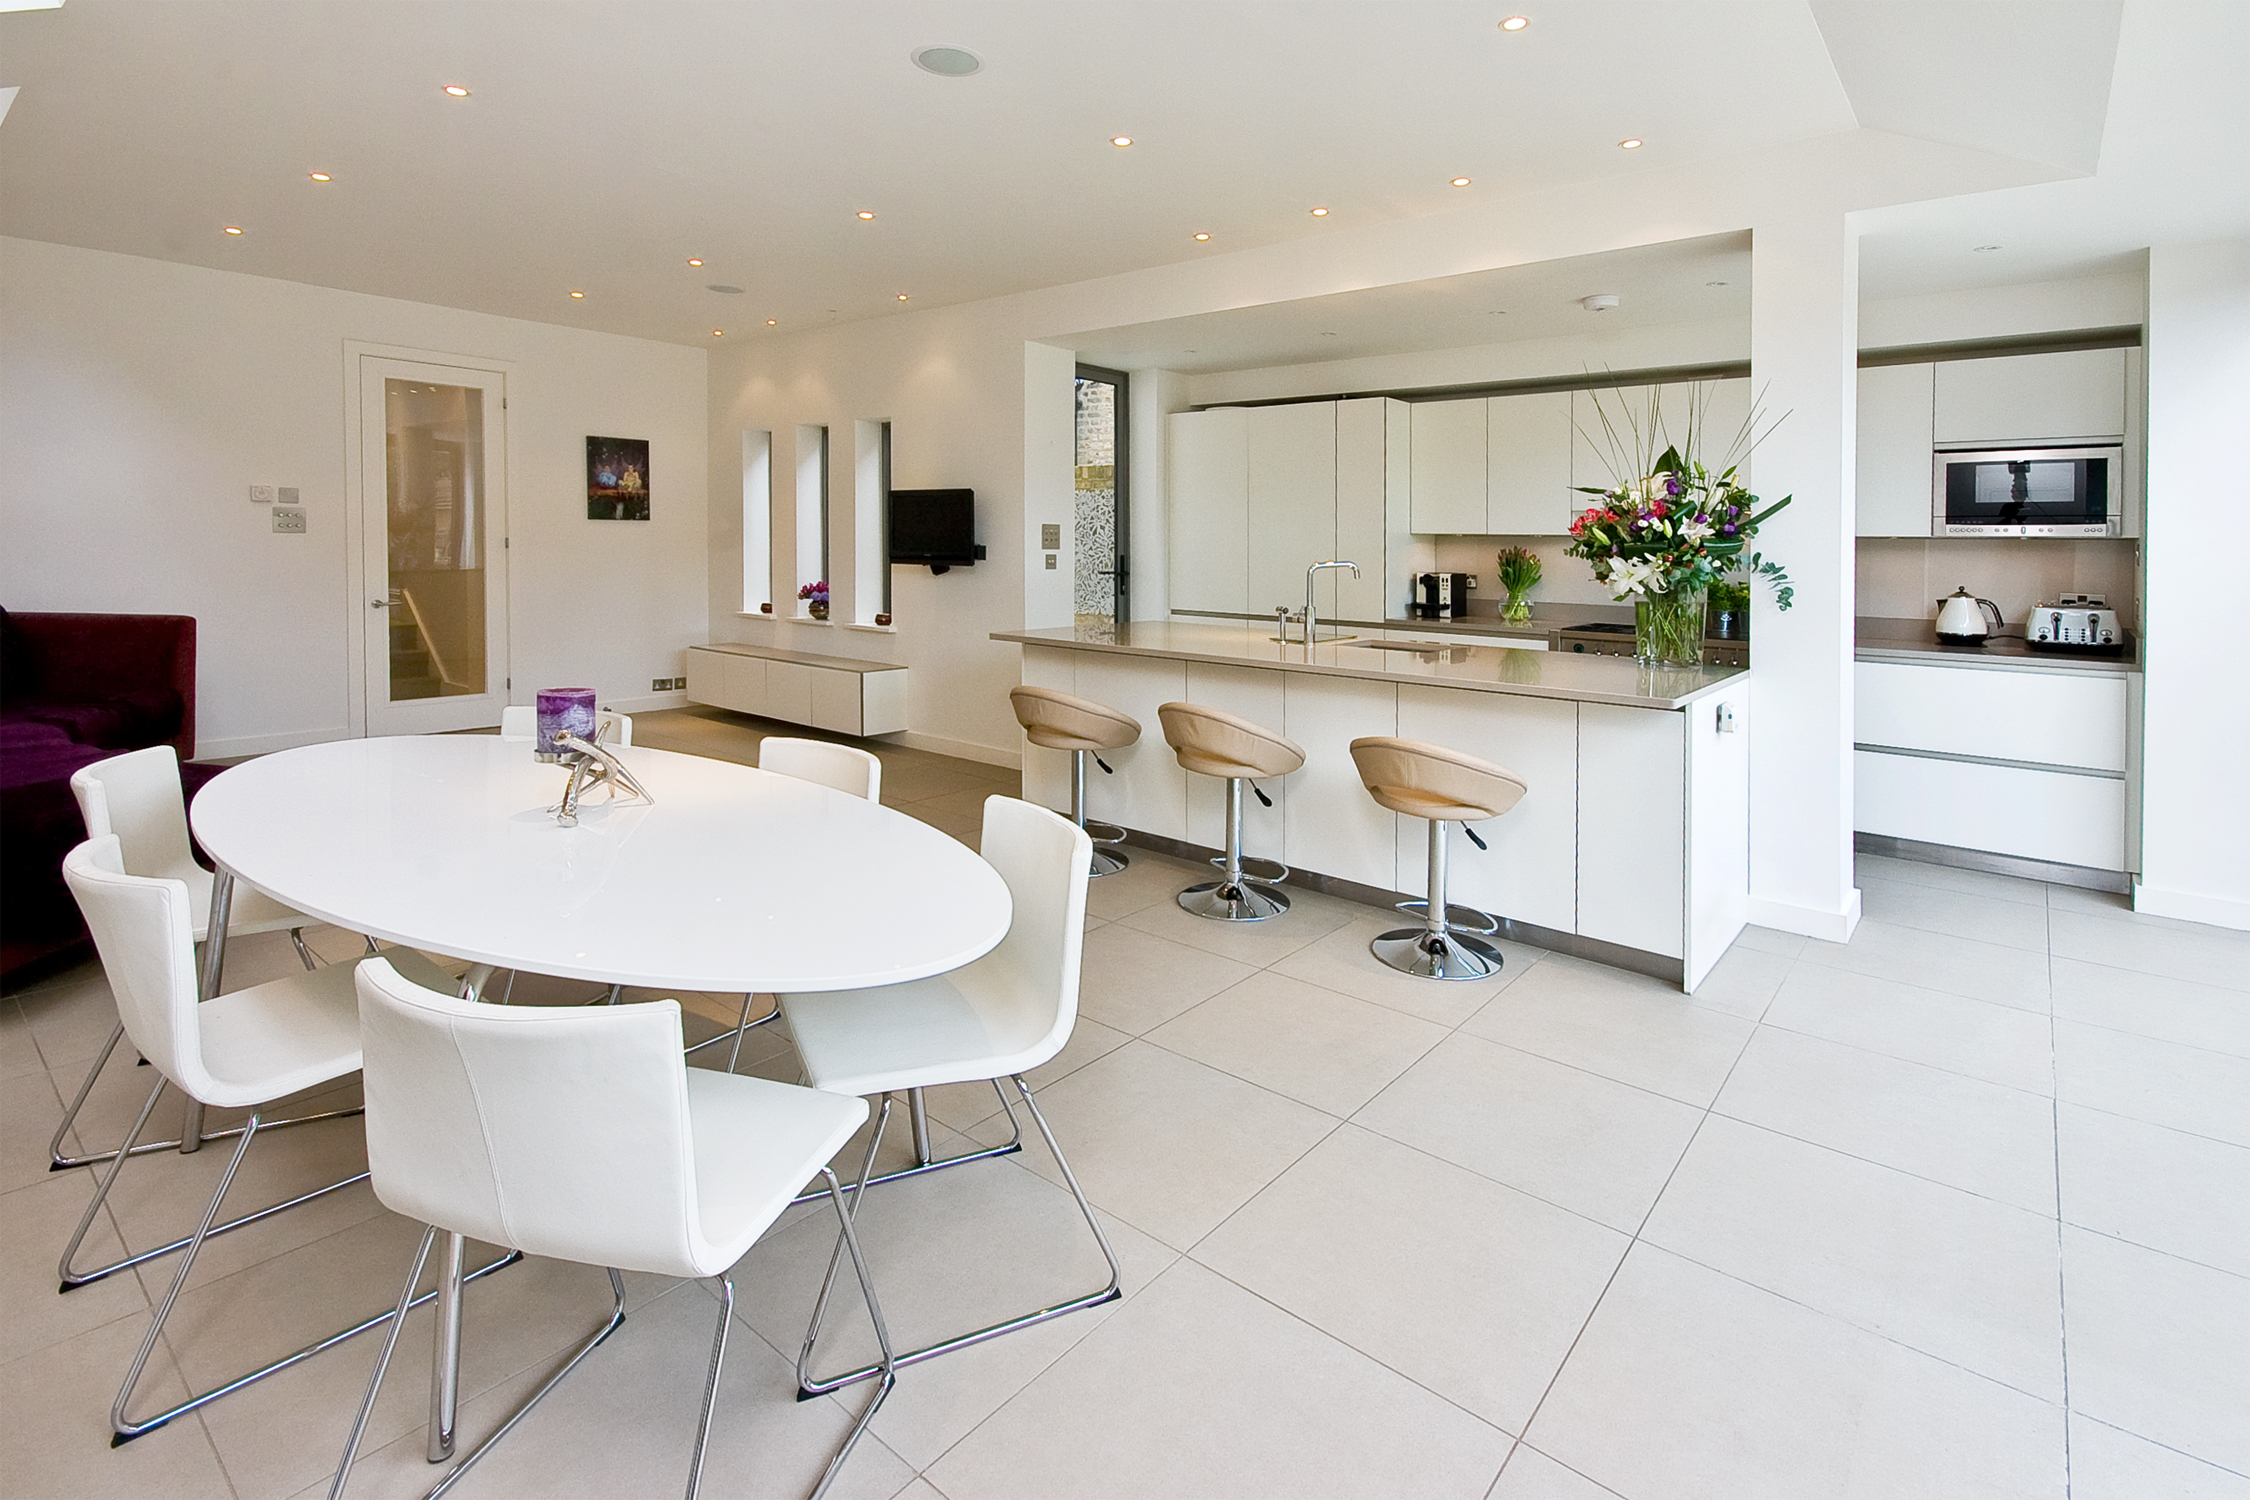 Open Plan Kitchen Ideas Uk plain open plan kitchen ideas uk l and design decorating